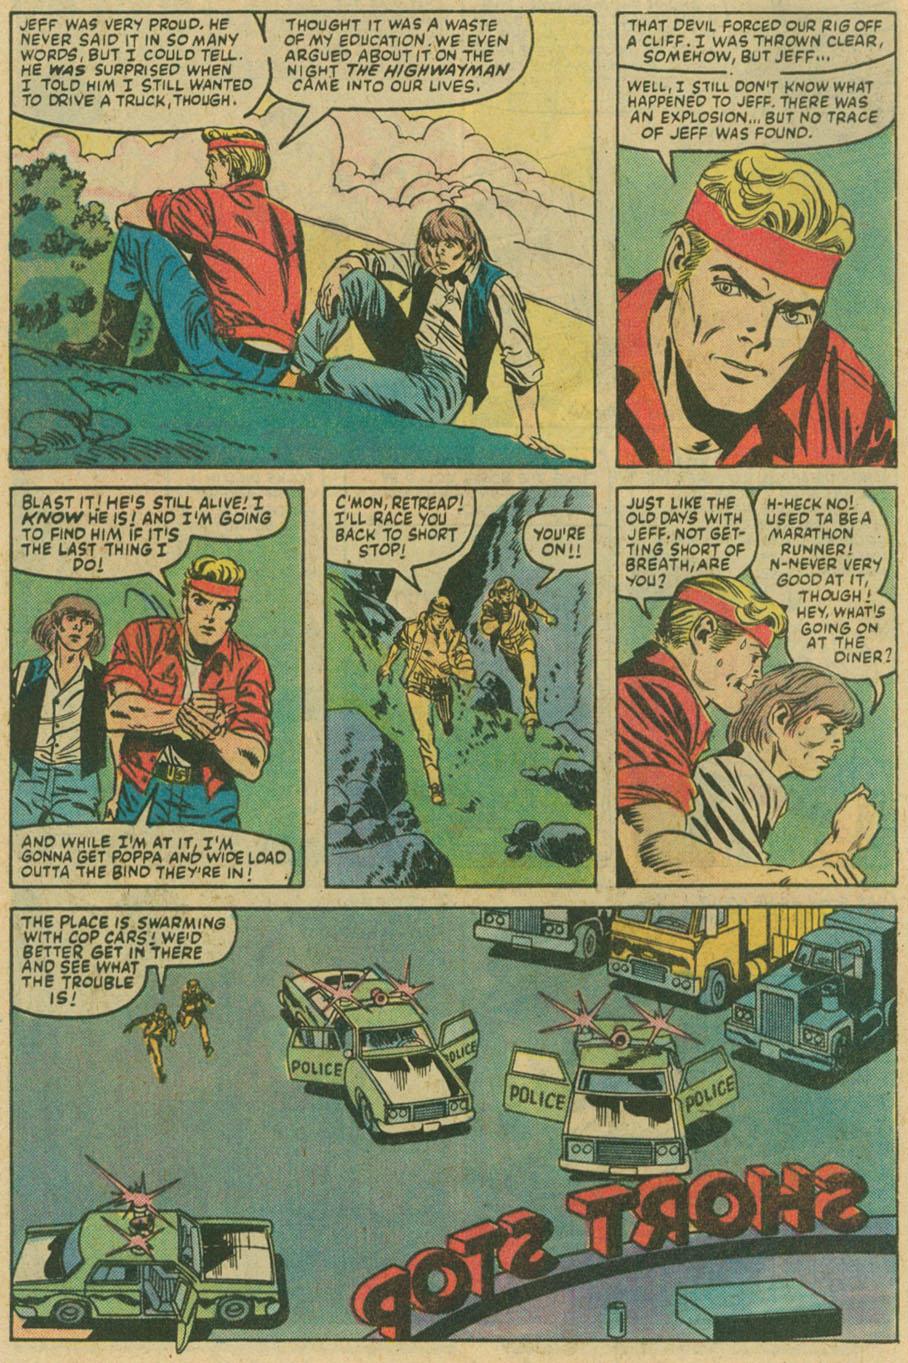 Read online U.S. 1 comic -  Issue #6 - 6